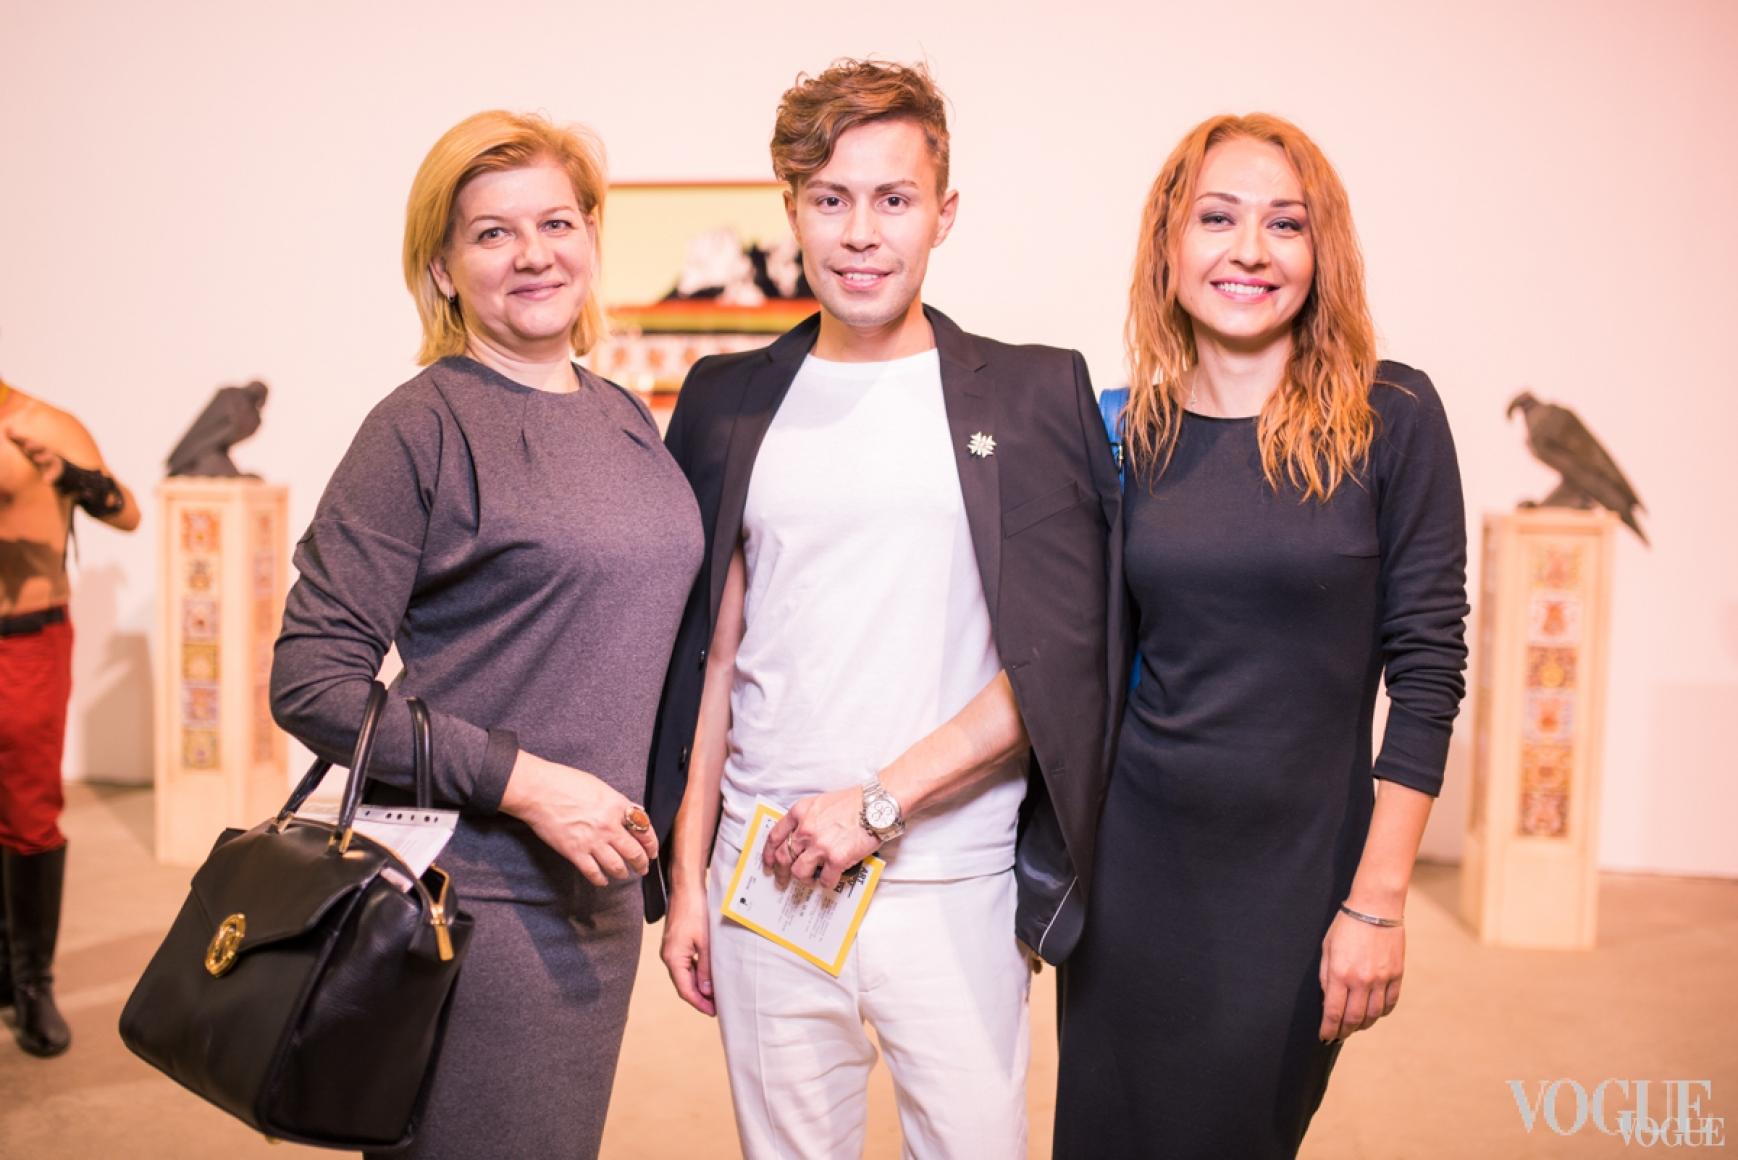 Виктория Якушева, Алексей Прищепа, Мария Орлова